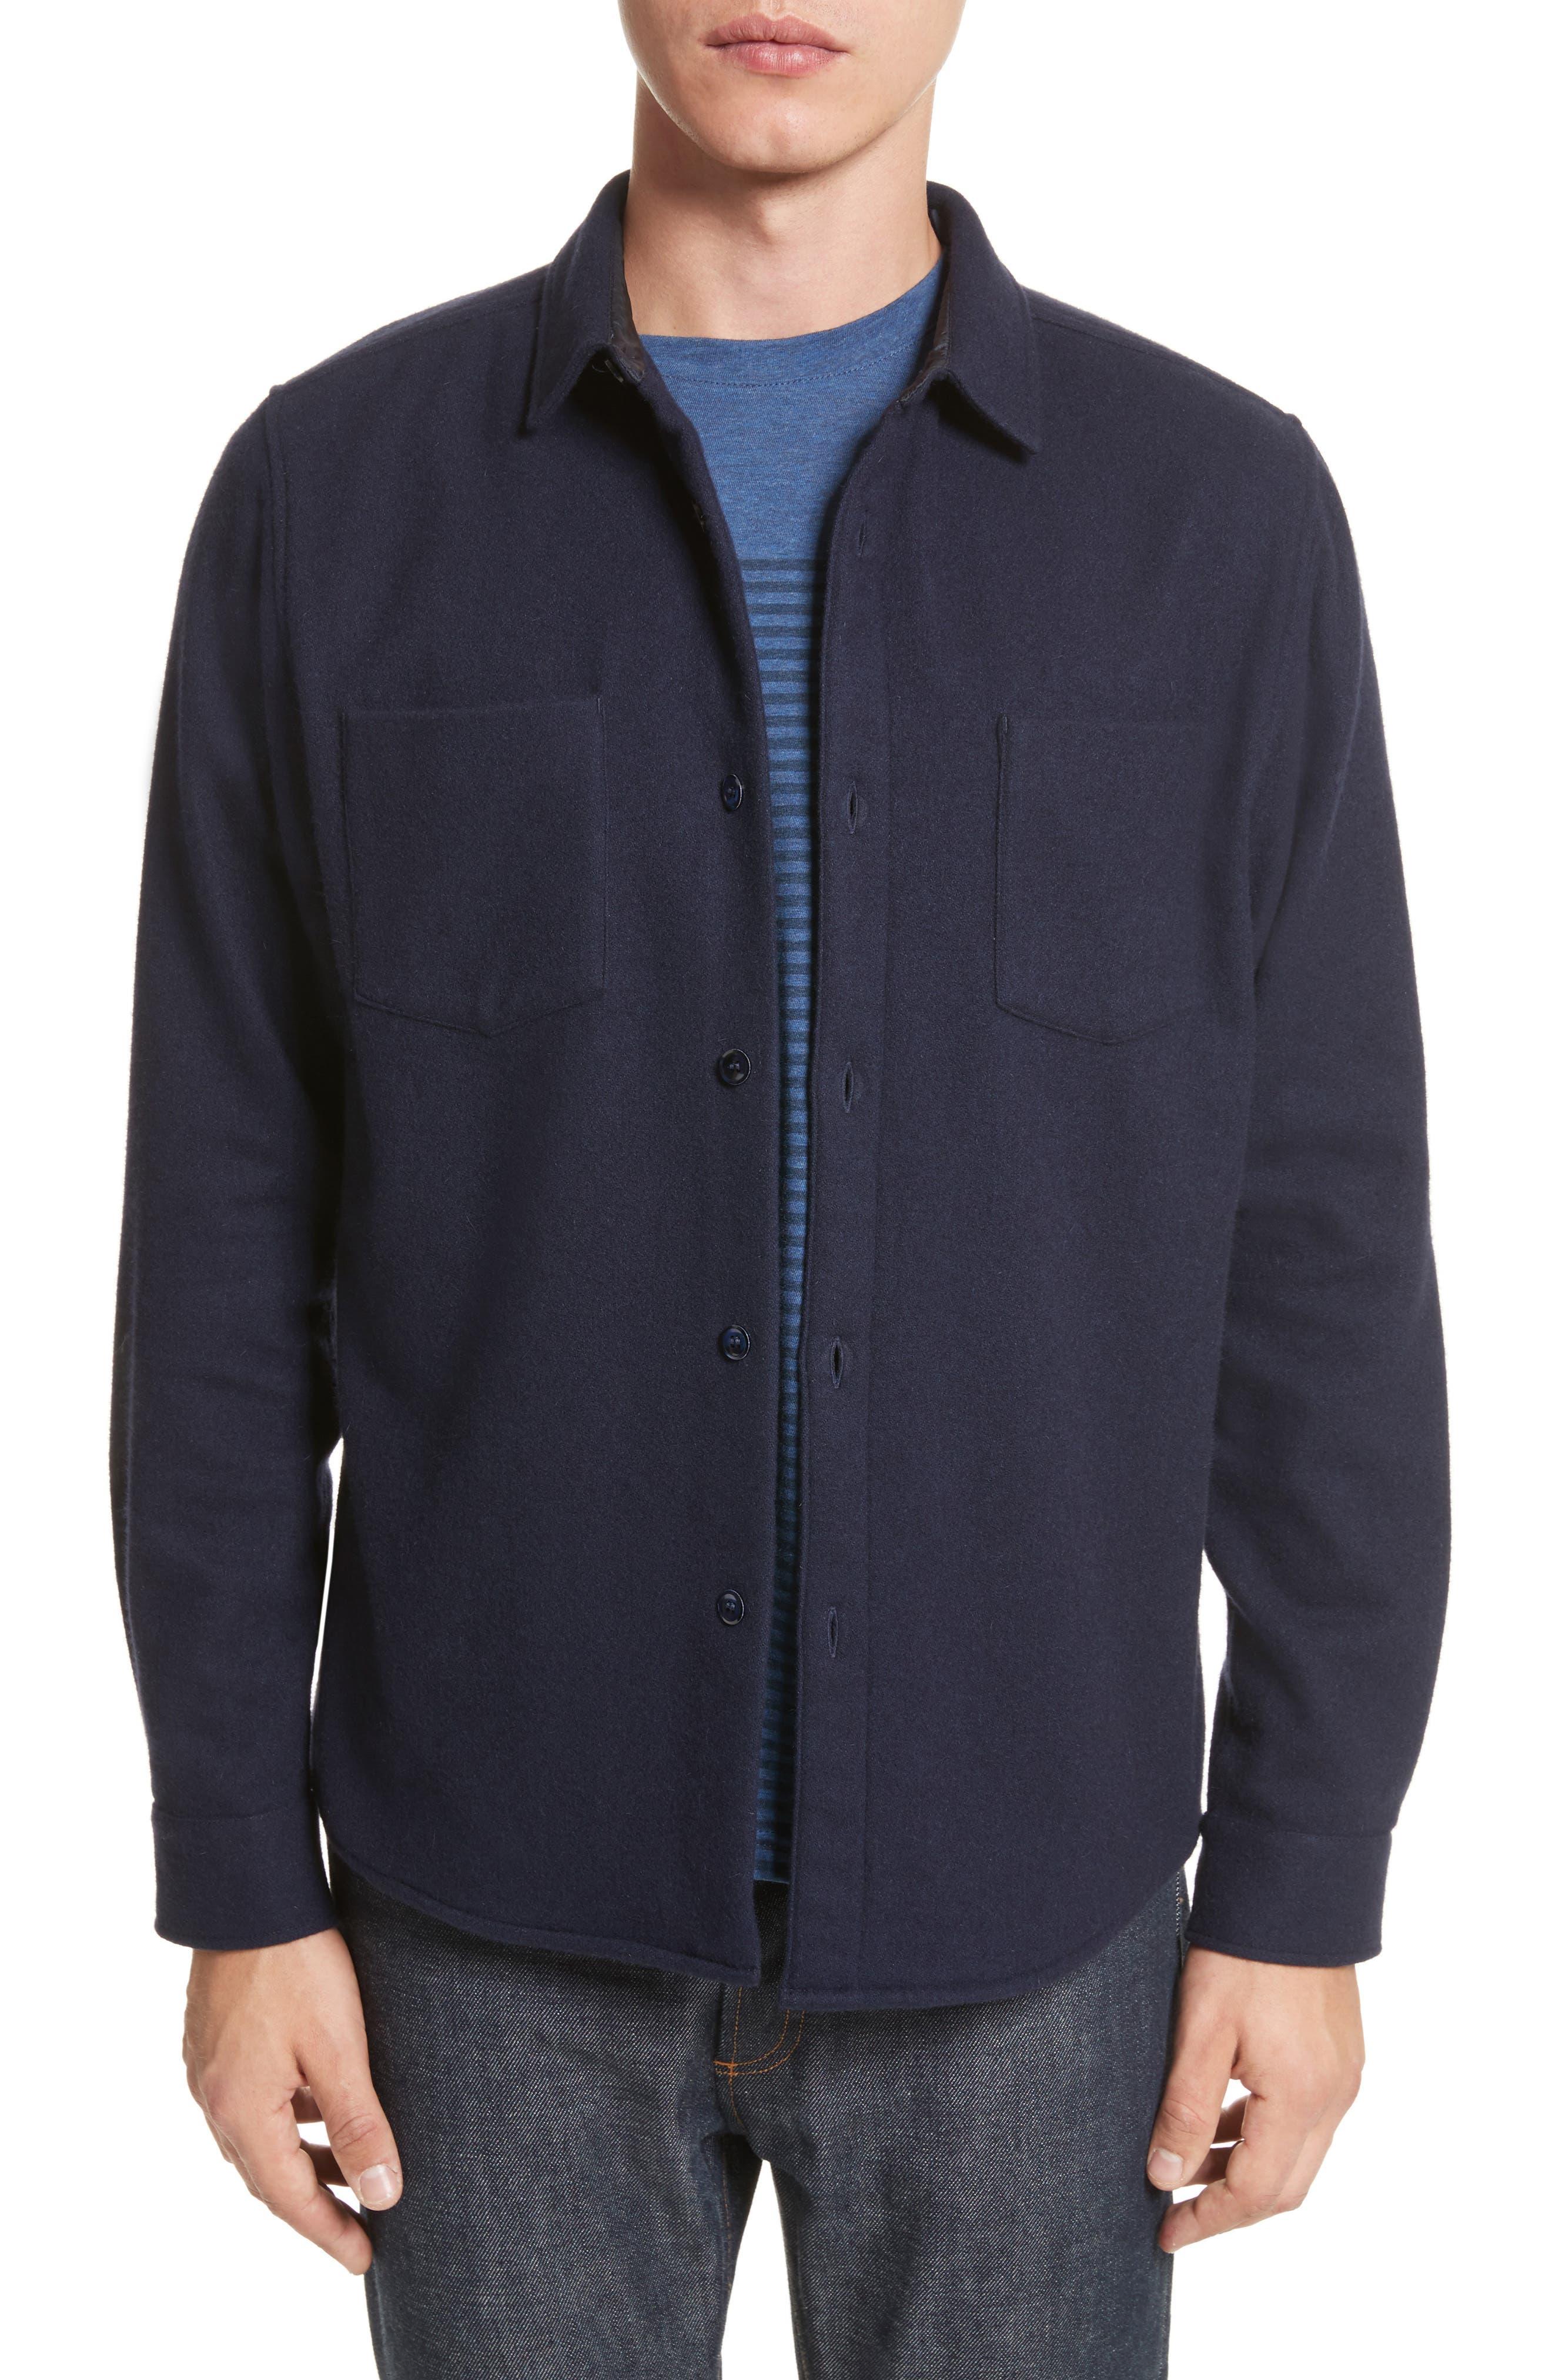 Fritz Wool Blend Shirt Jacket,                         Main,                         color, 410